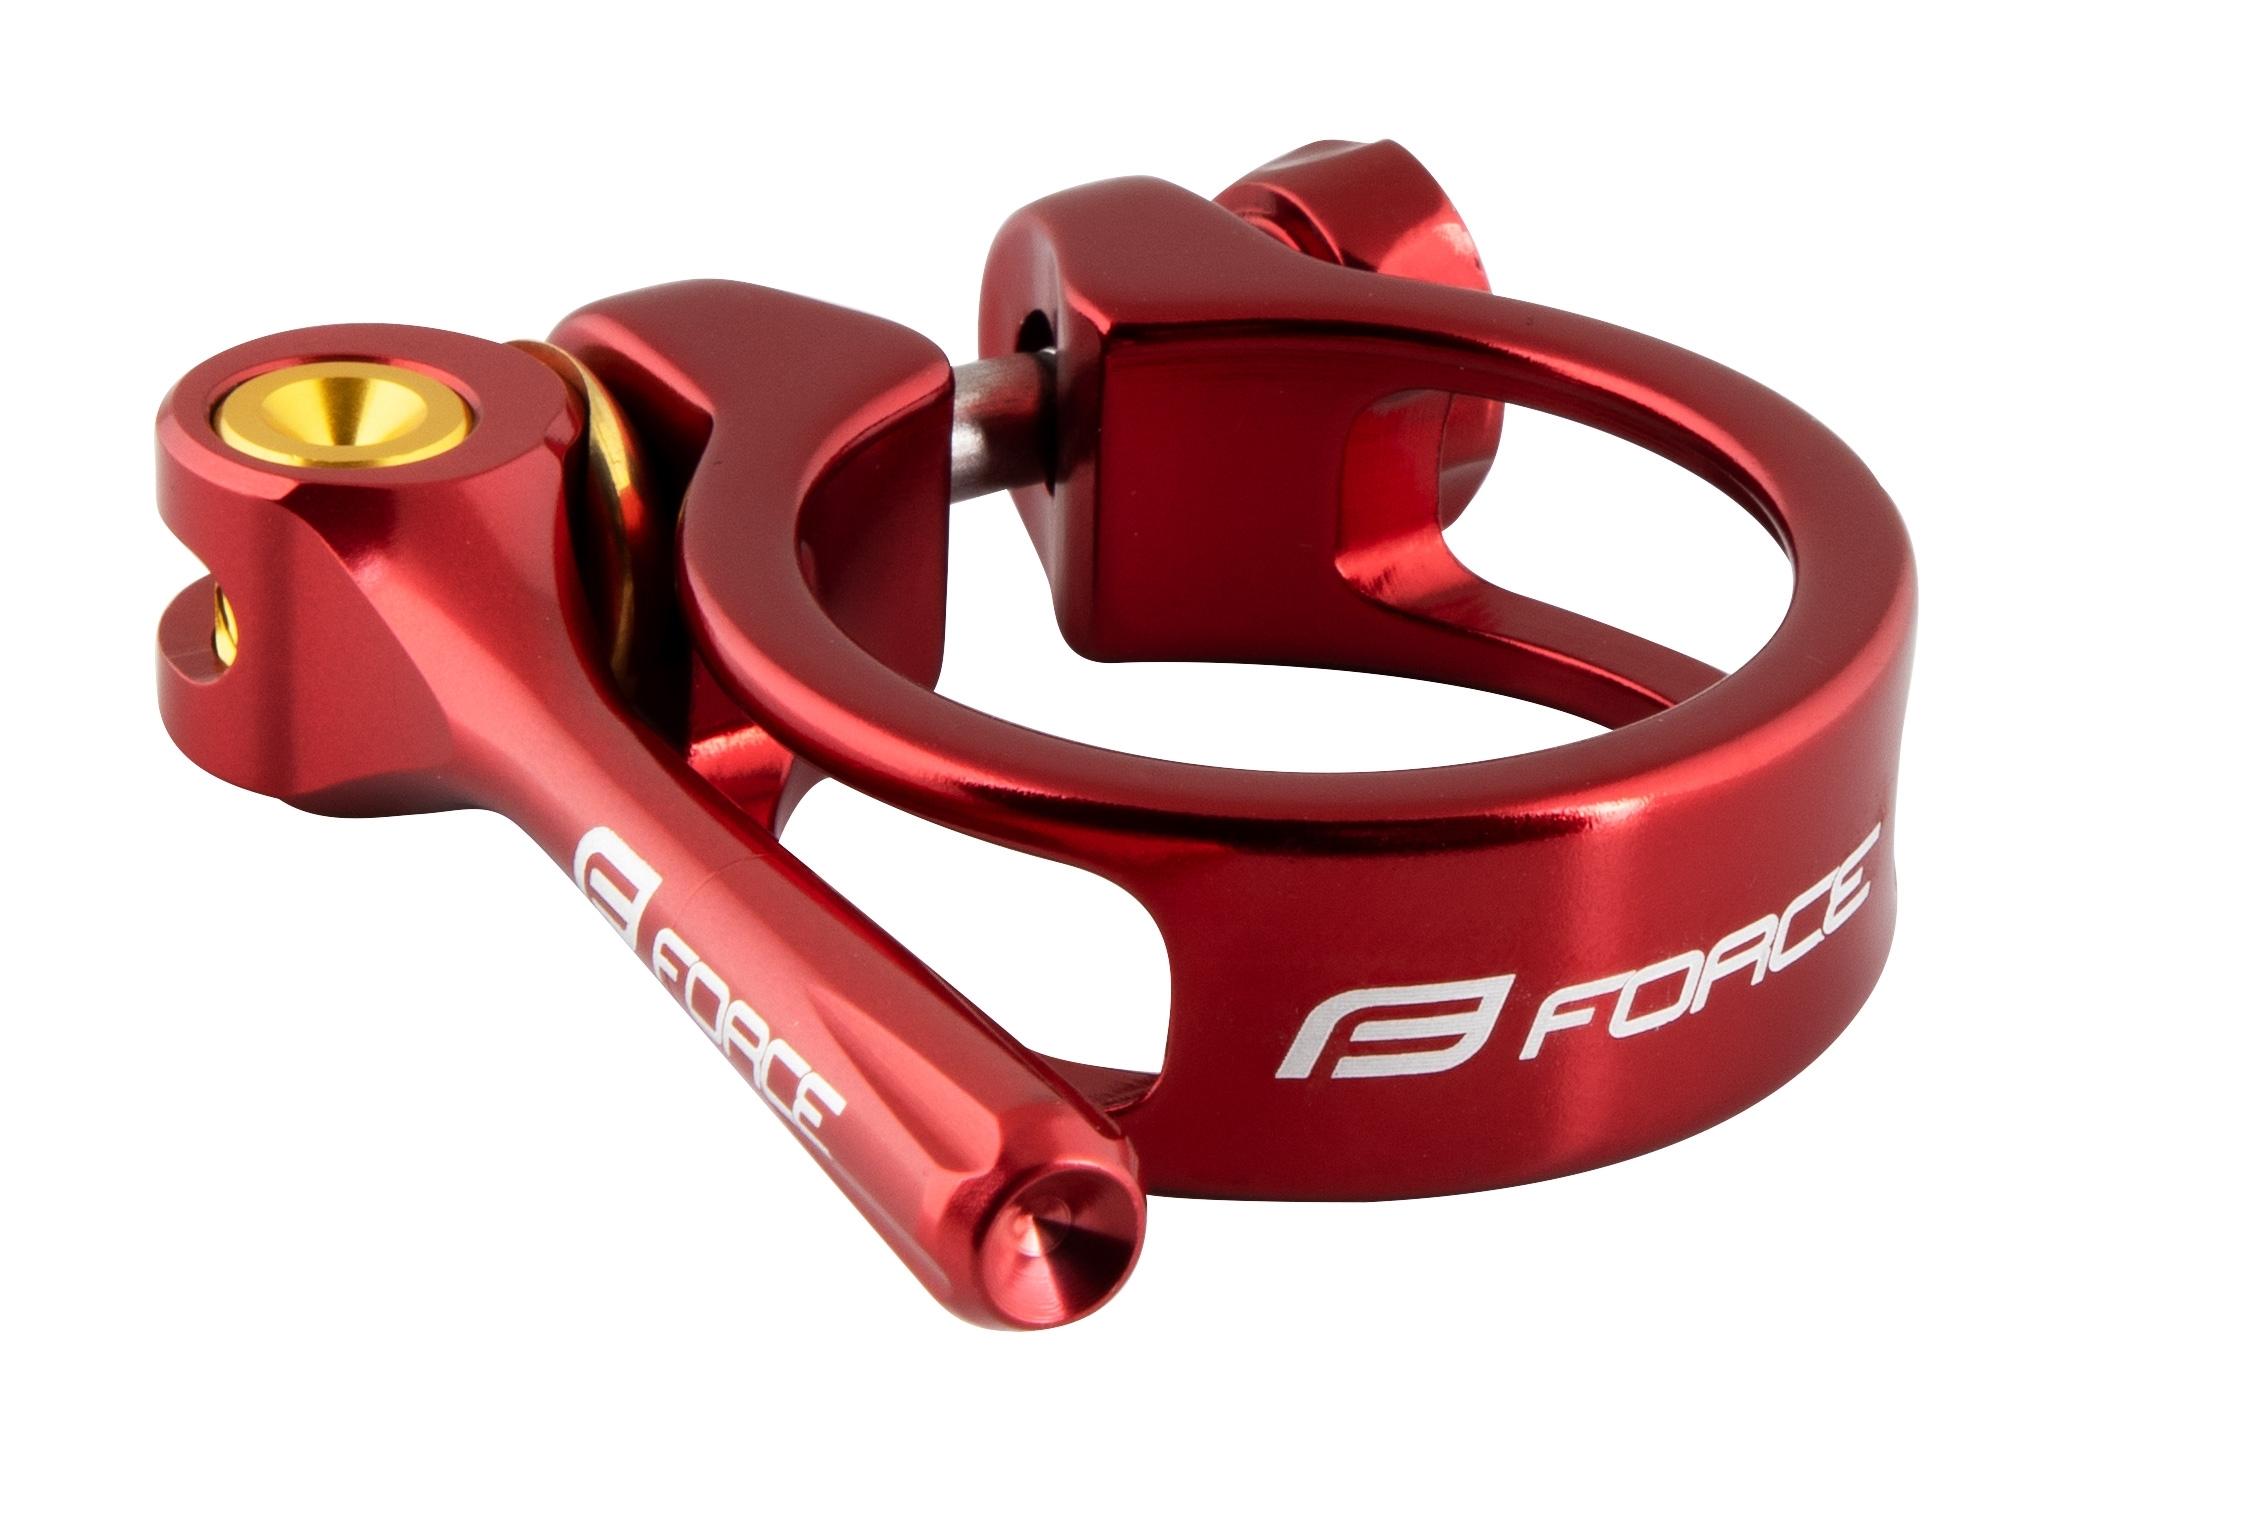 objímka sedlovky FORCE s RÚ 34,9mm Al, červená